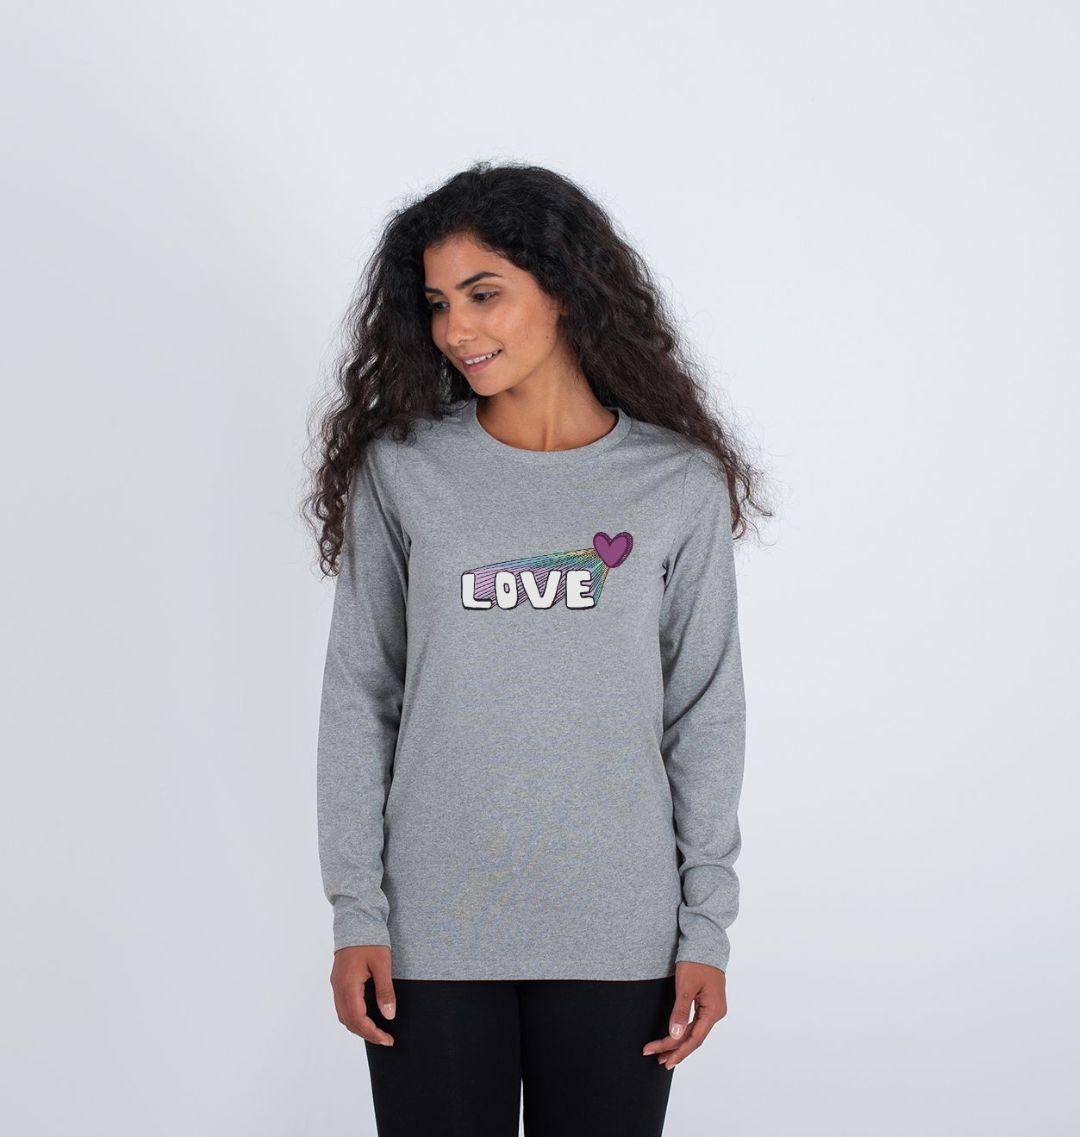 Women's Let Your Love Shine Longsleeve Top Kind Shop 5